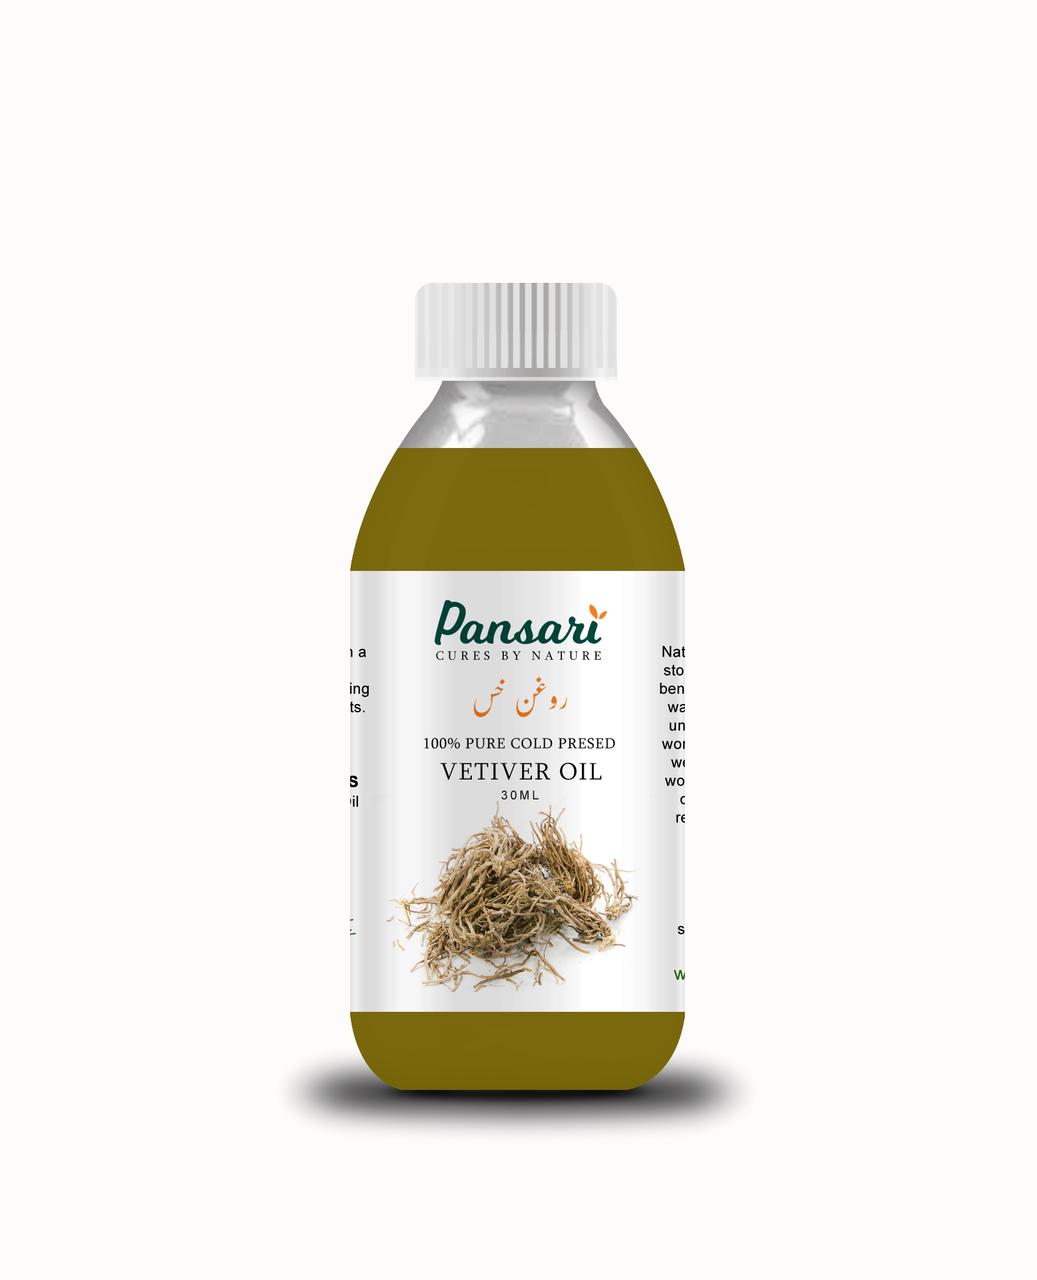 Pansari's 100% Pure Vetiver Oil